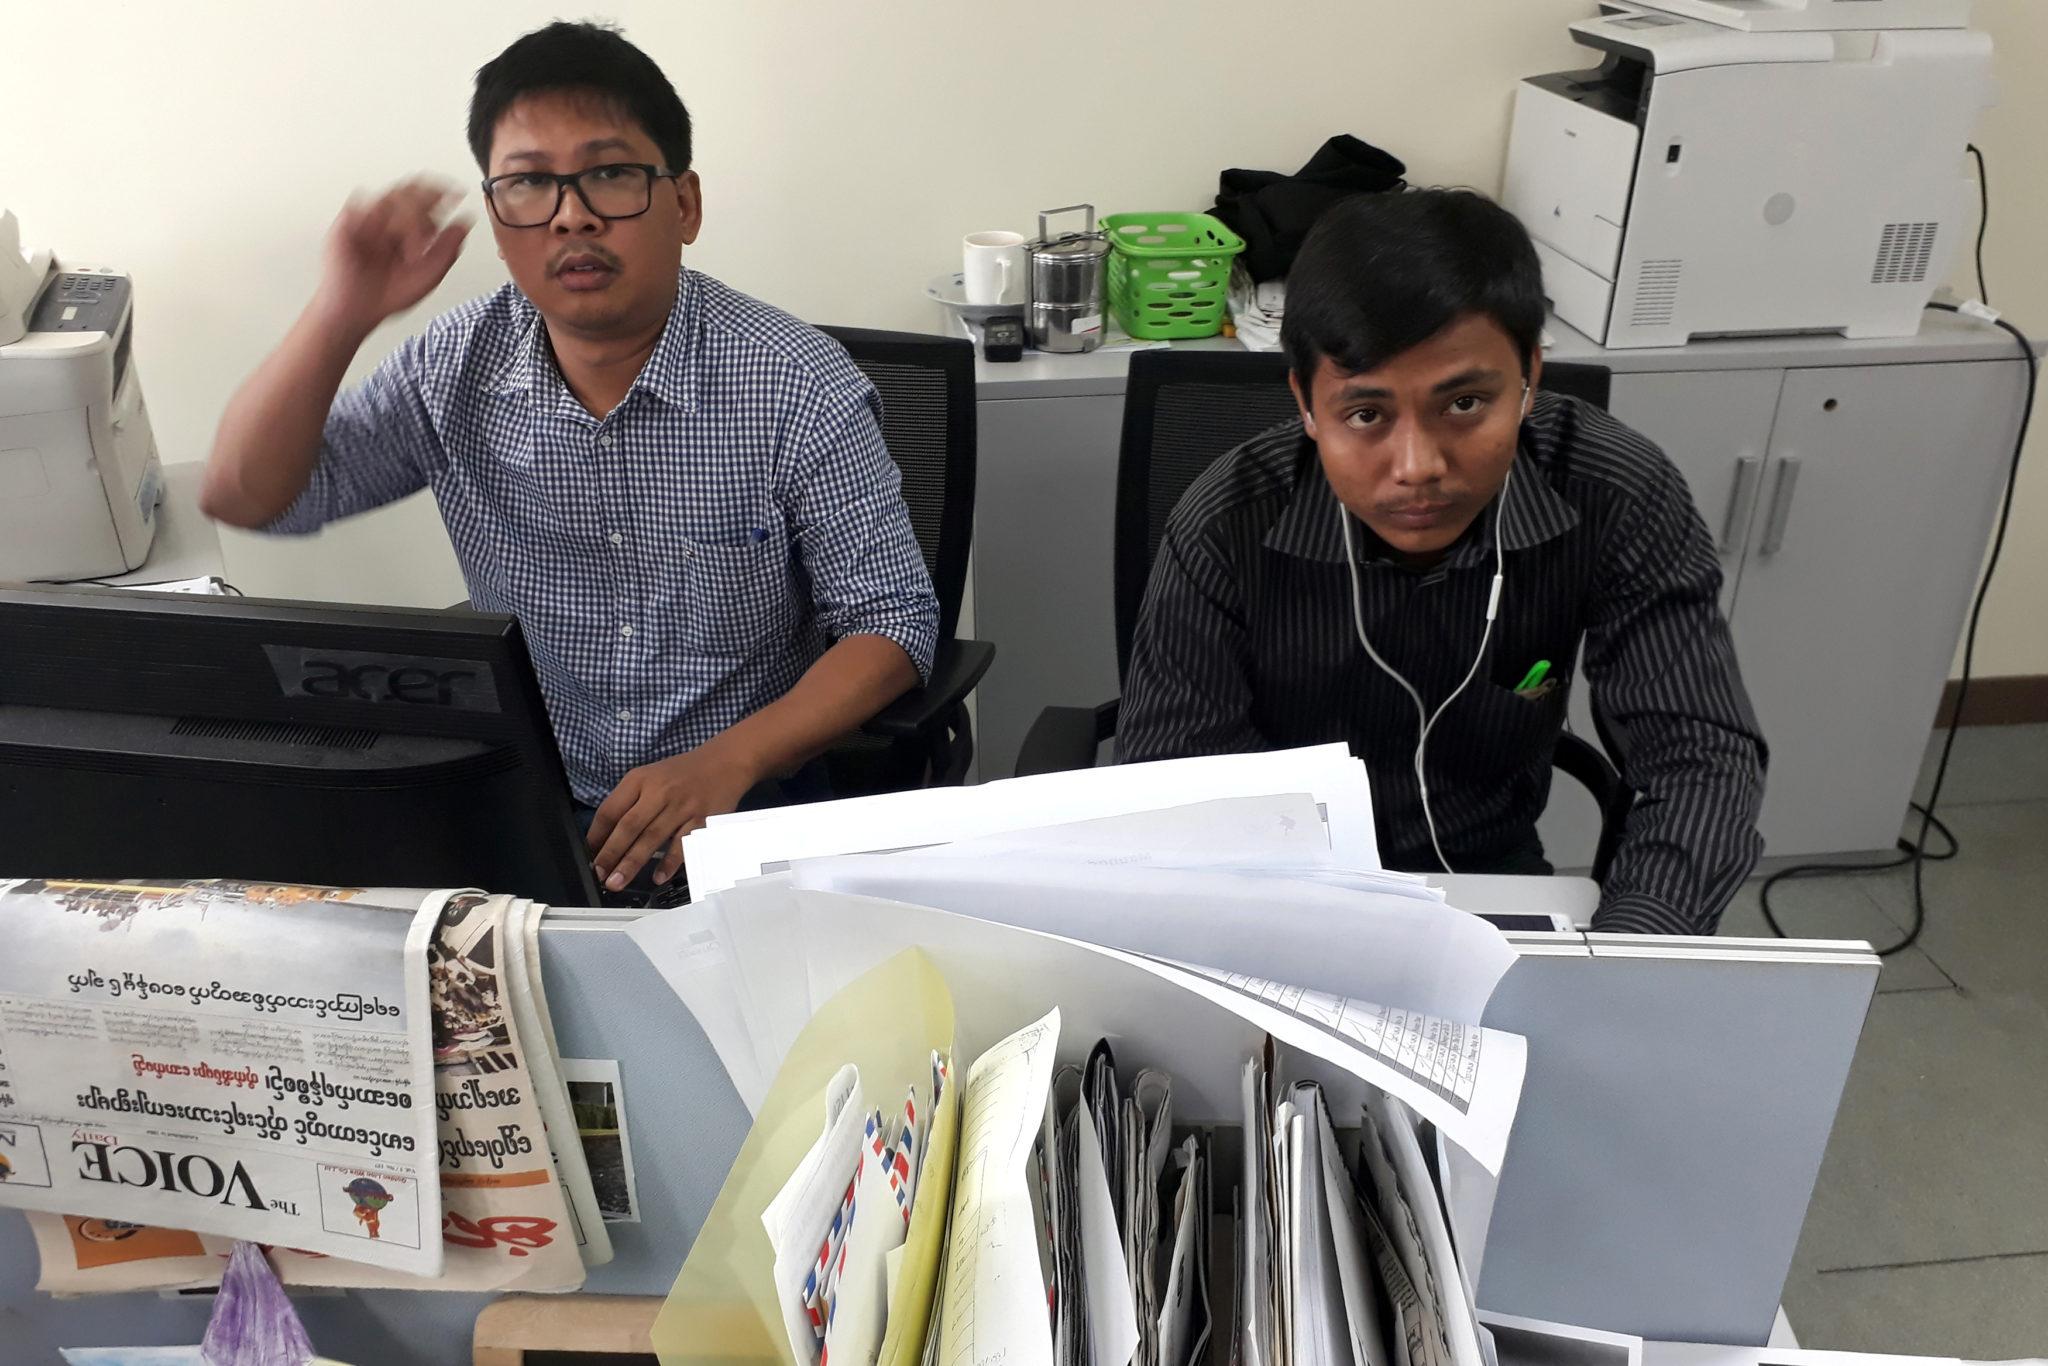 Myanmar: Release journalists facing 14 years in prison